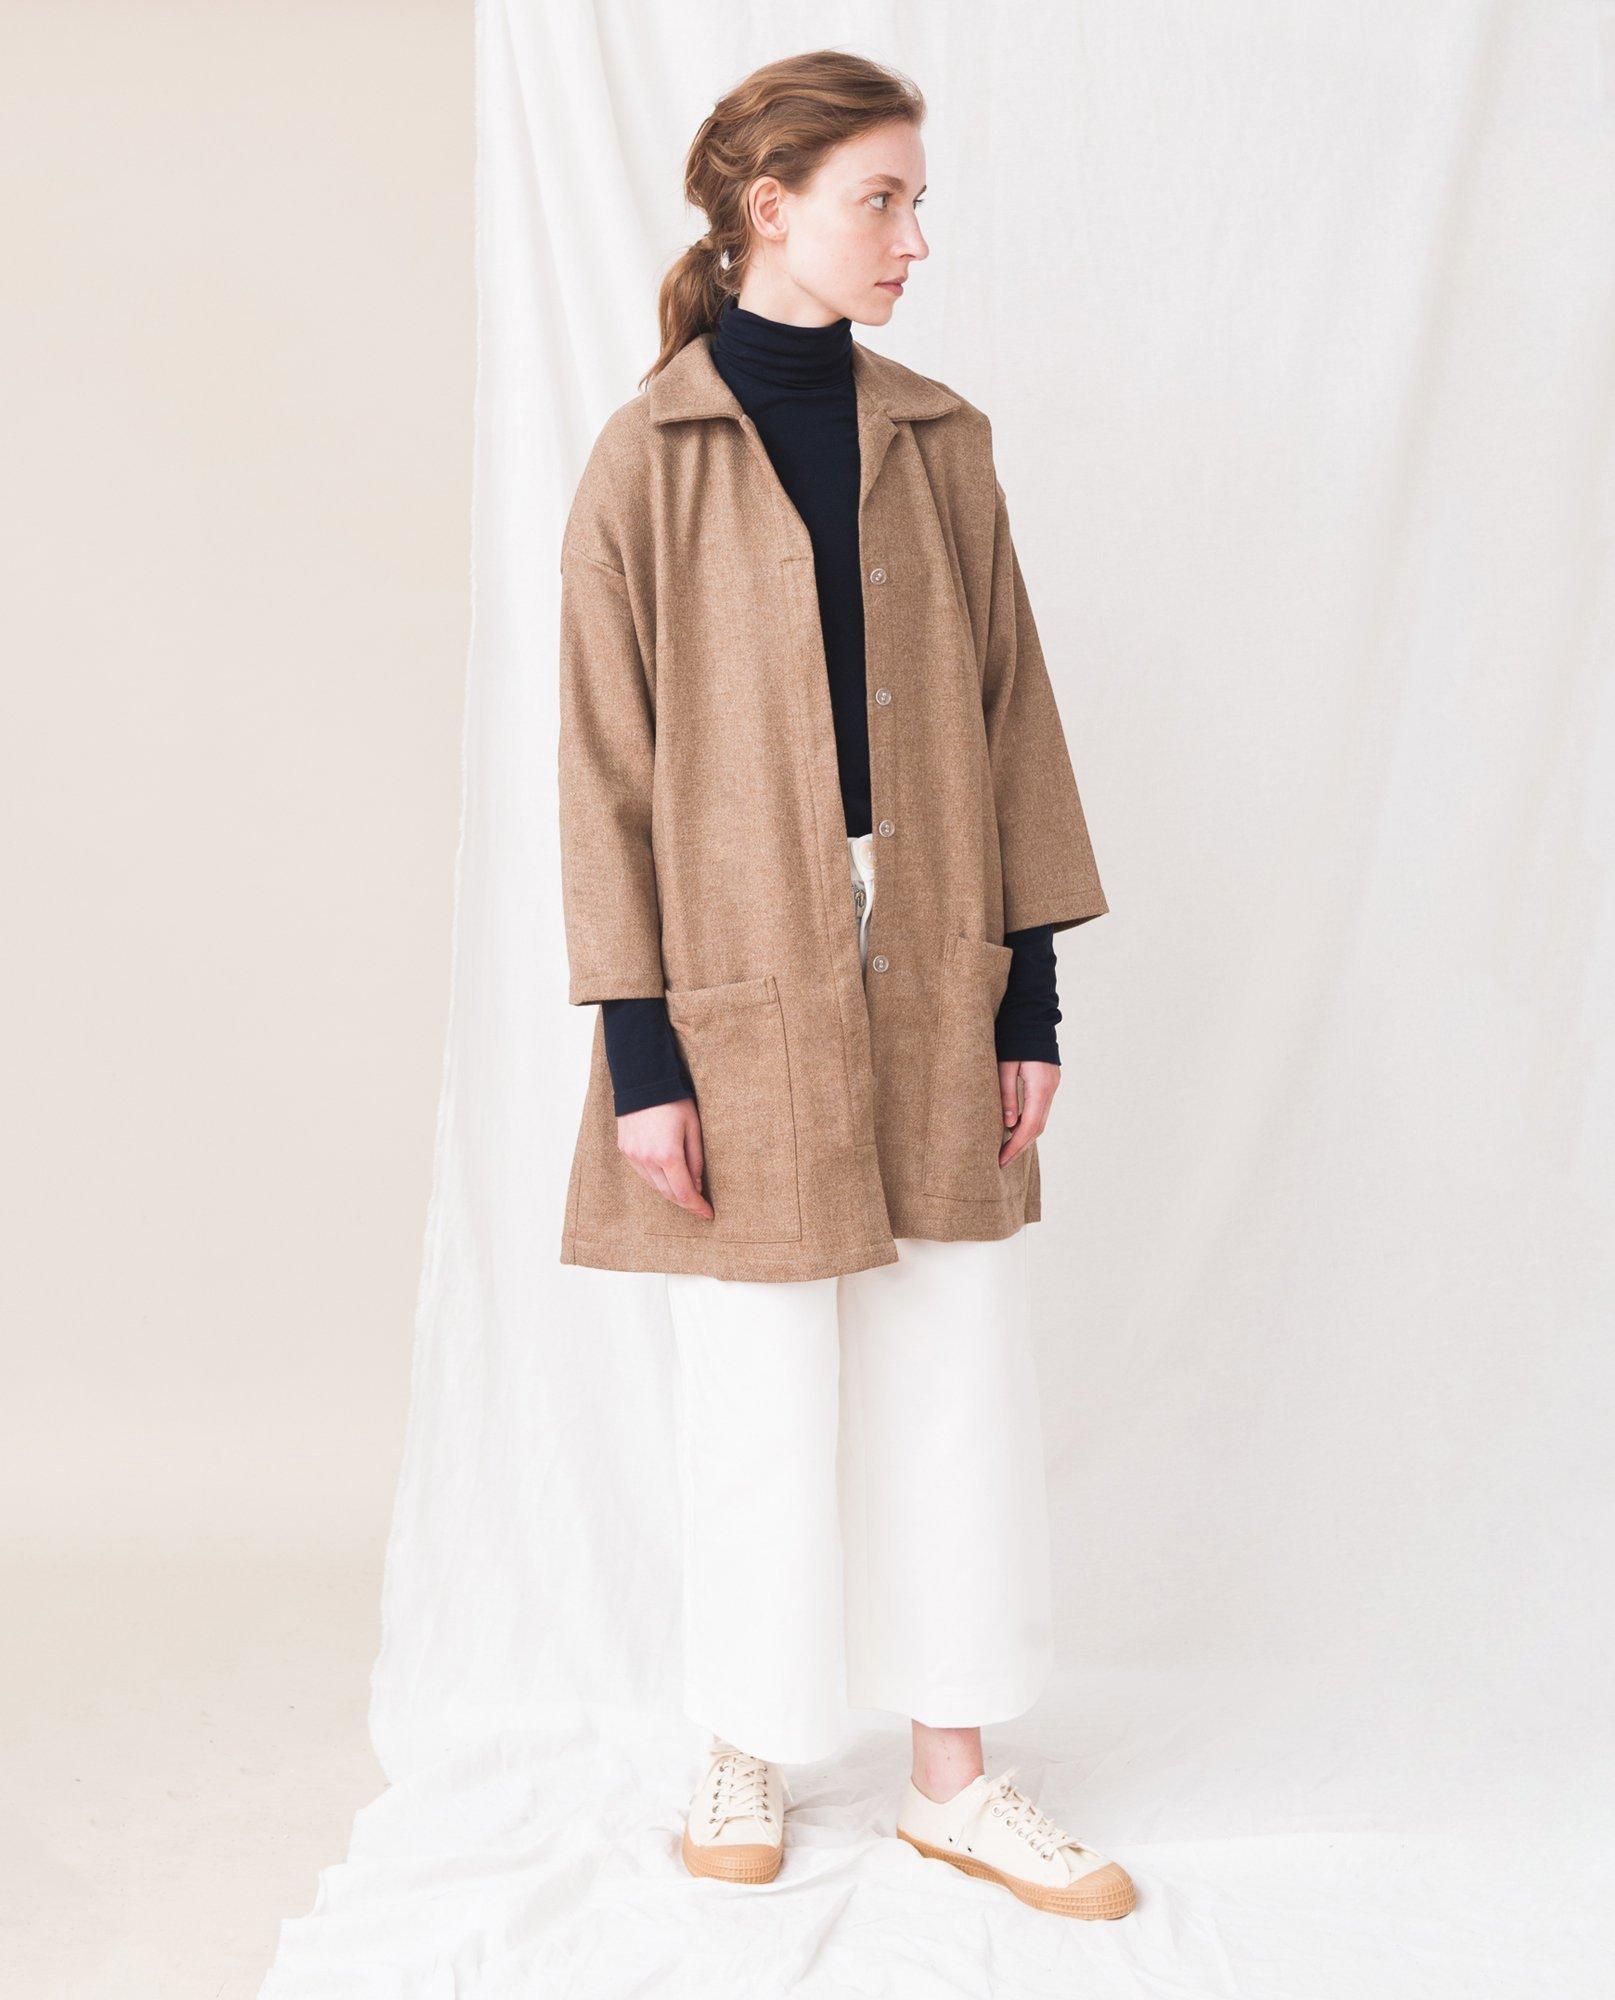 HETTY Wool Coat In Tan from Beaumont Organic